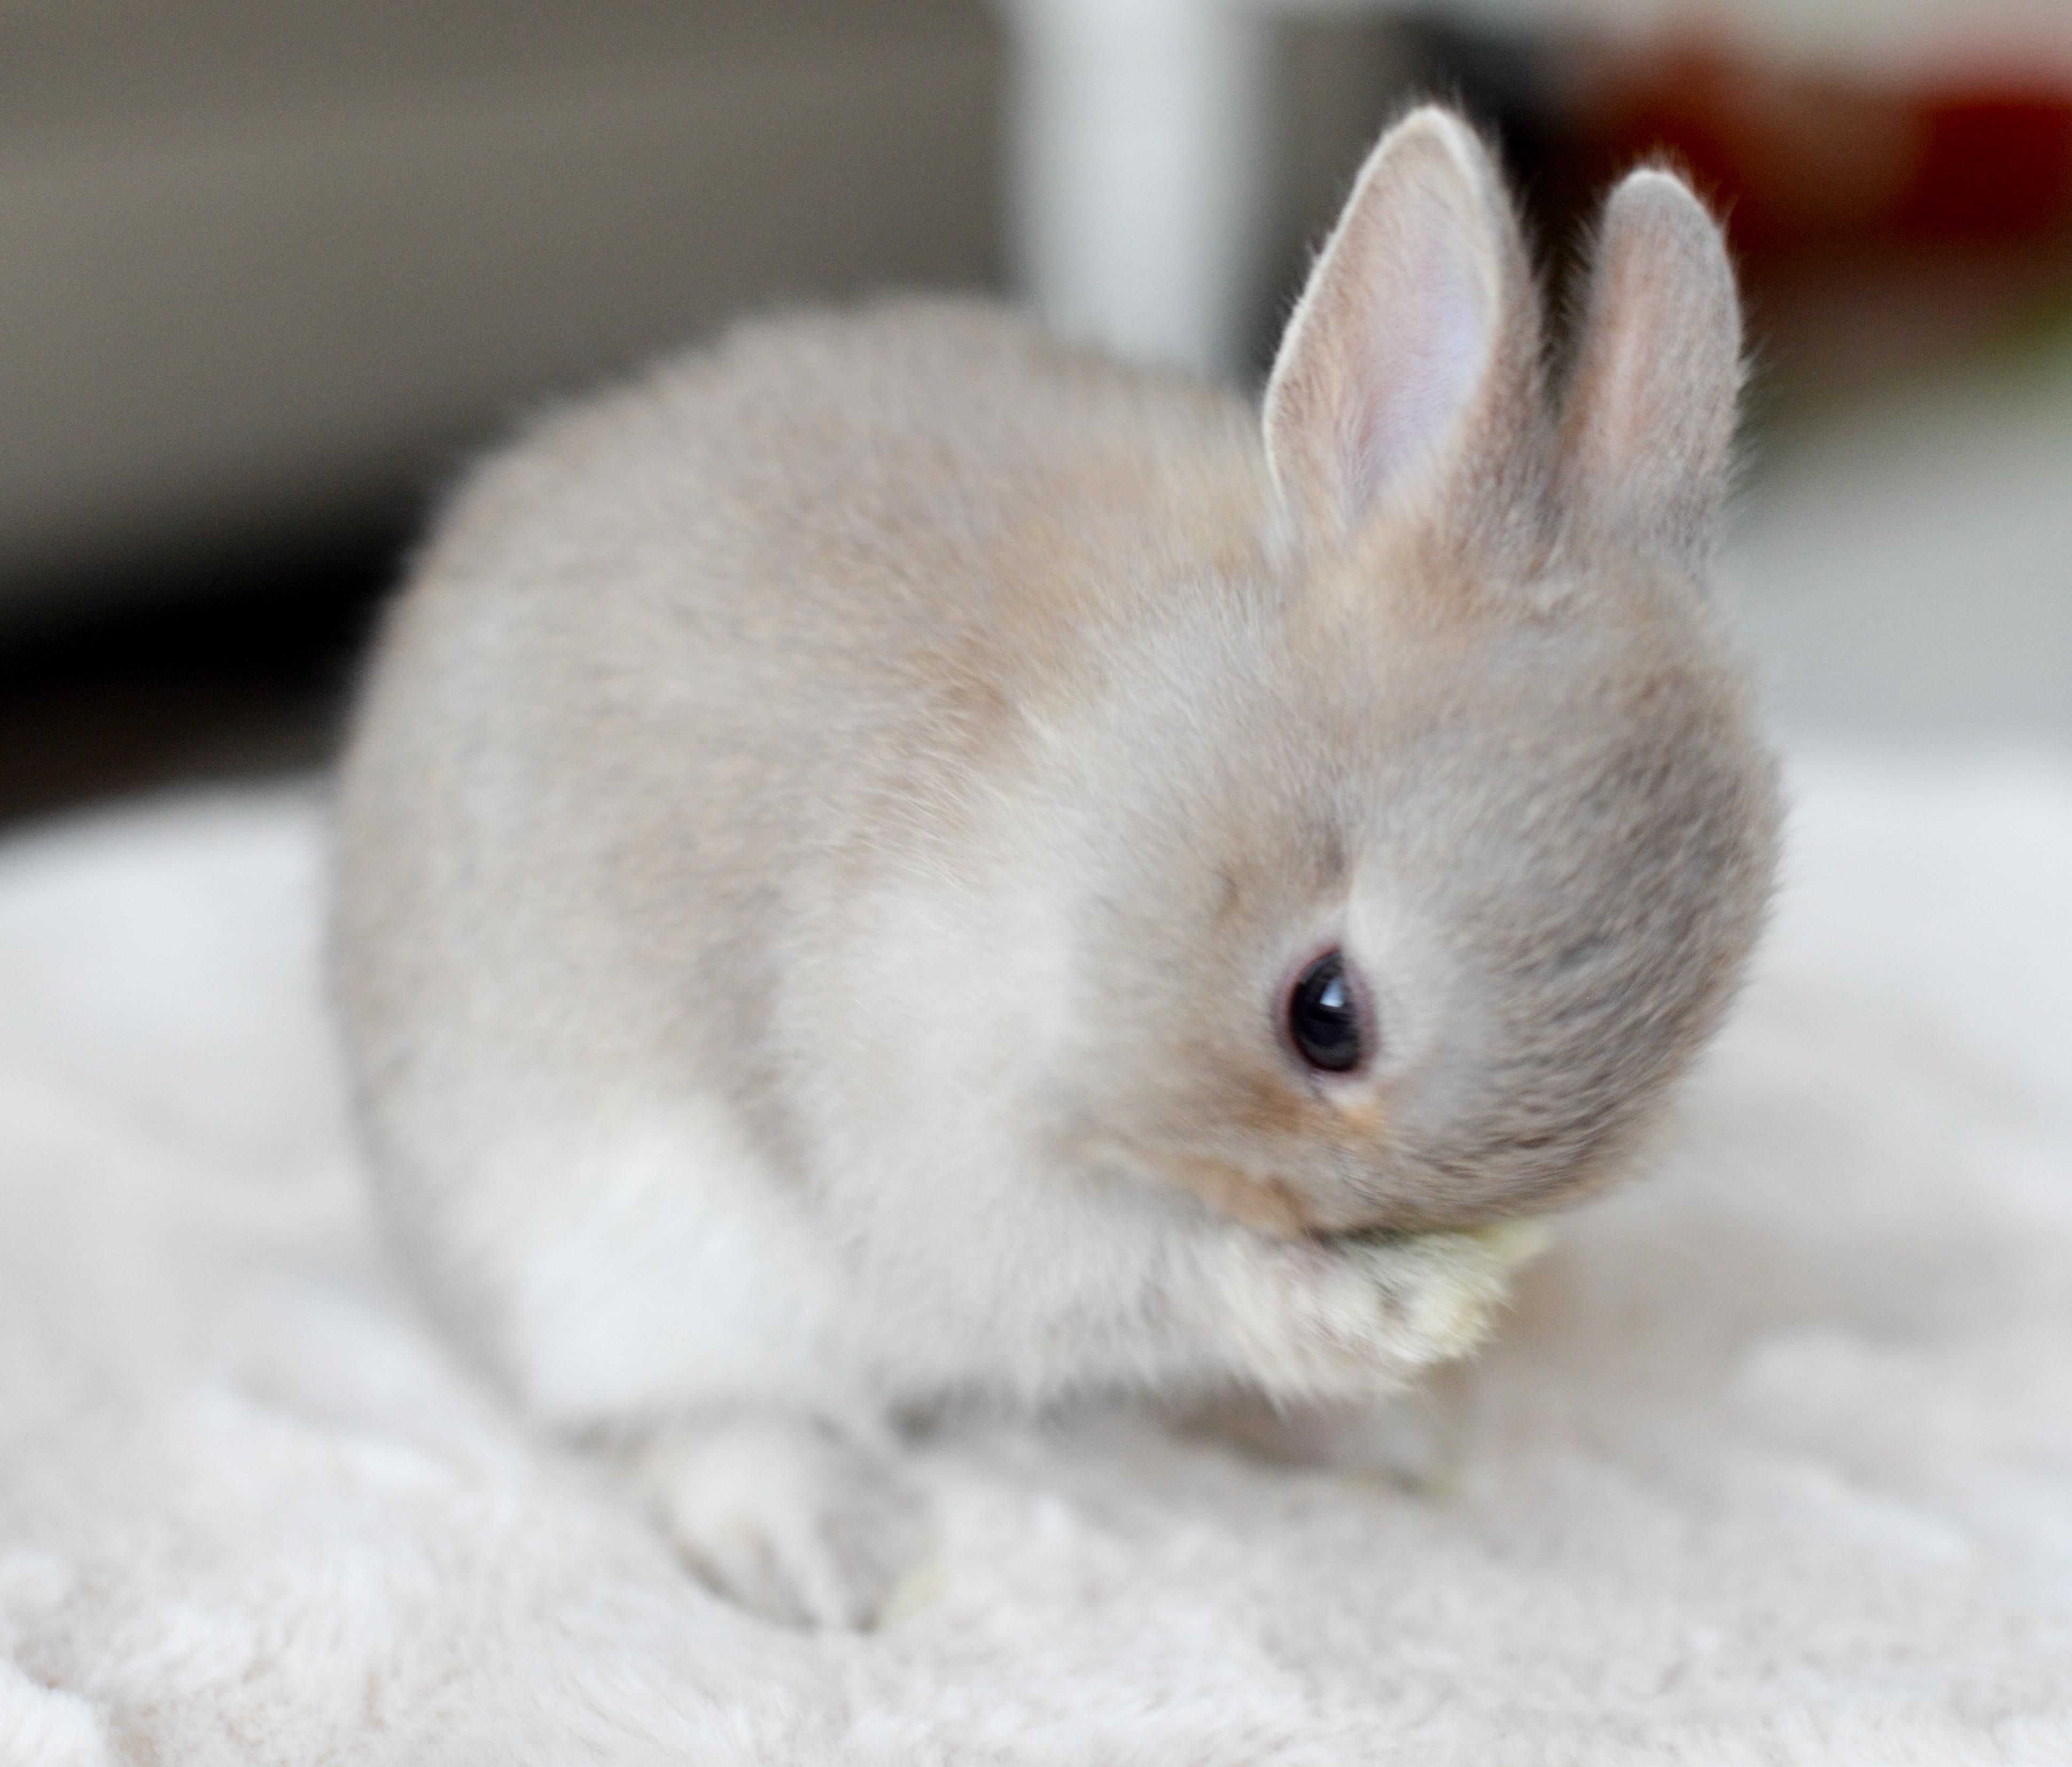 Pin By Tristan Graham On Bunbuns Cute Baby Bunnies Pet Bunny